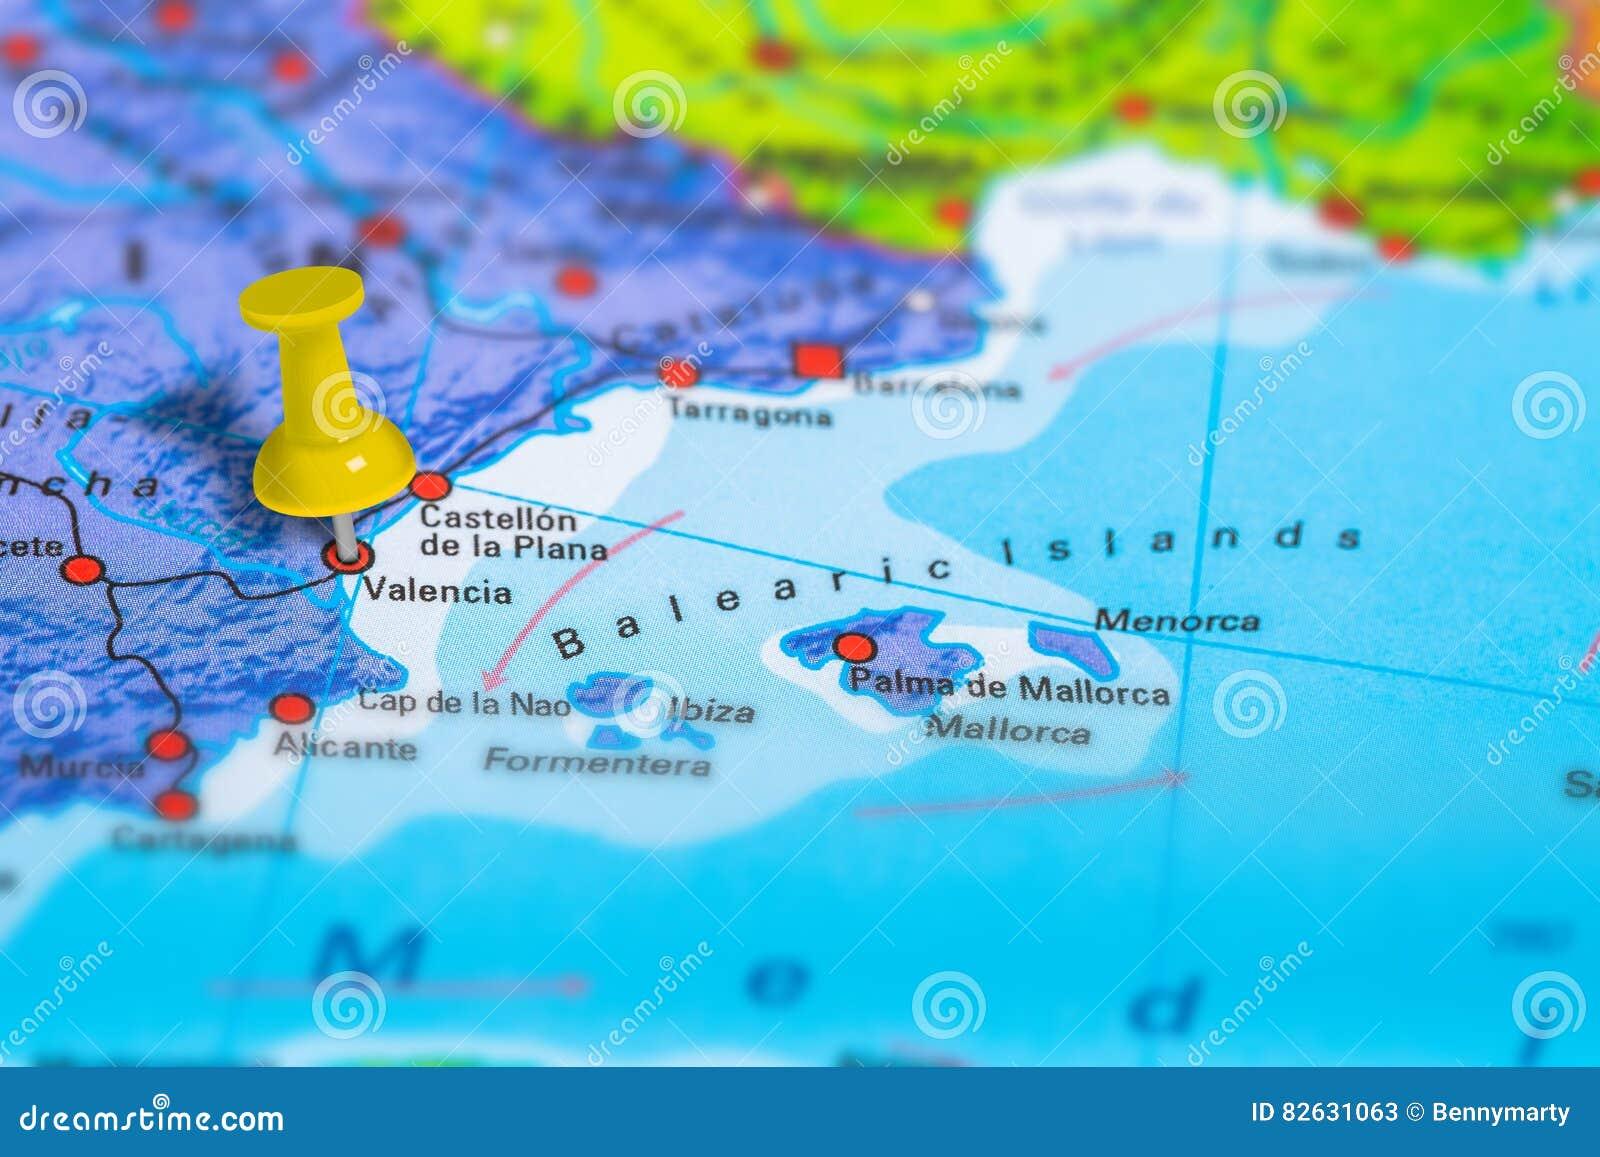 Valencia Spain Karte Stockbild Bild Von Festgesteckt 82631063